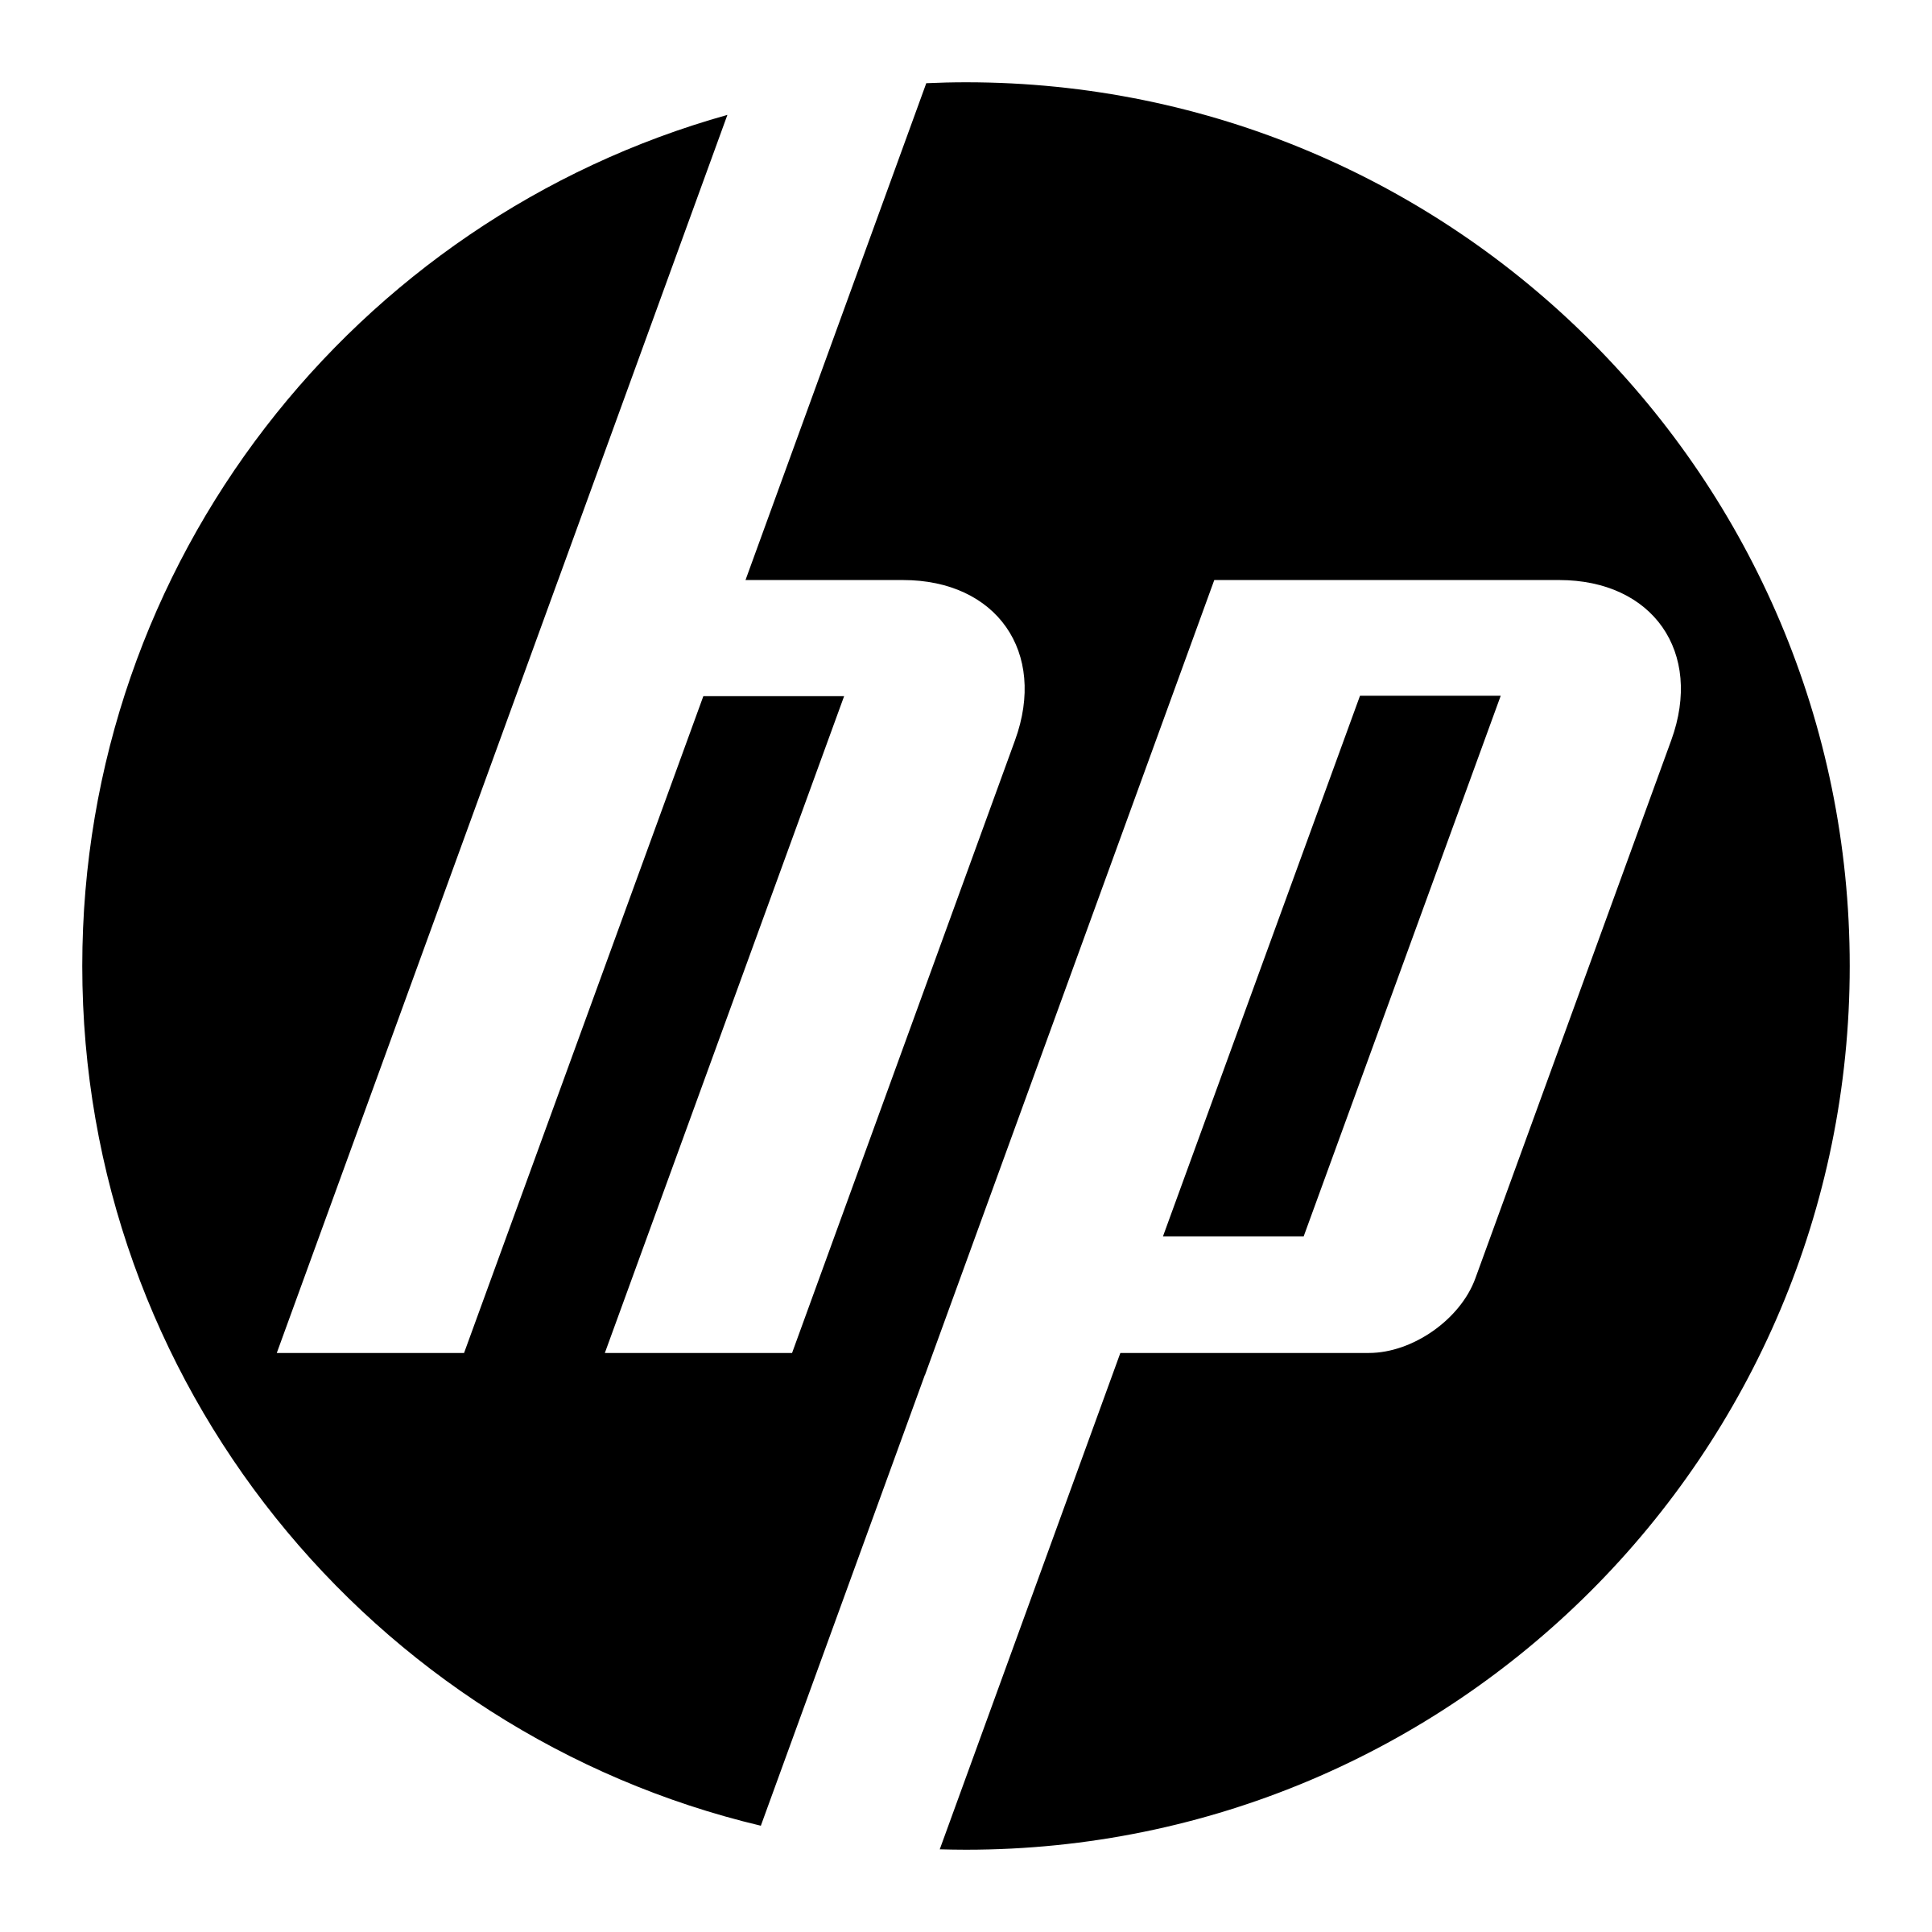 HP Logo PNG Transparent & SVG Vector.